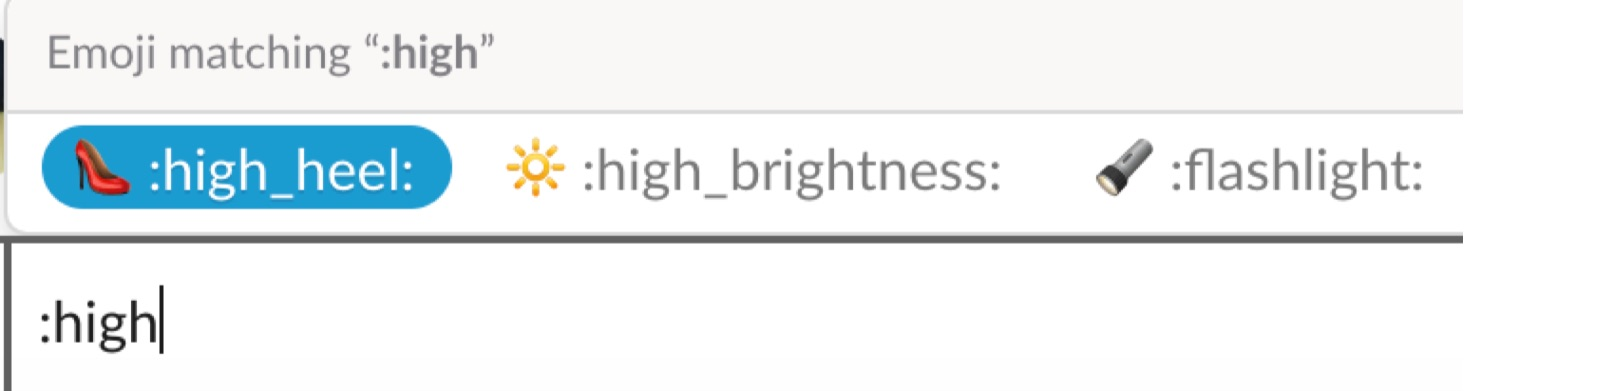 highfive-emoji-prayer